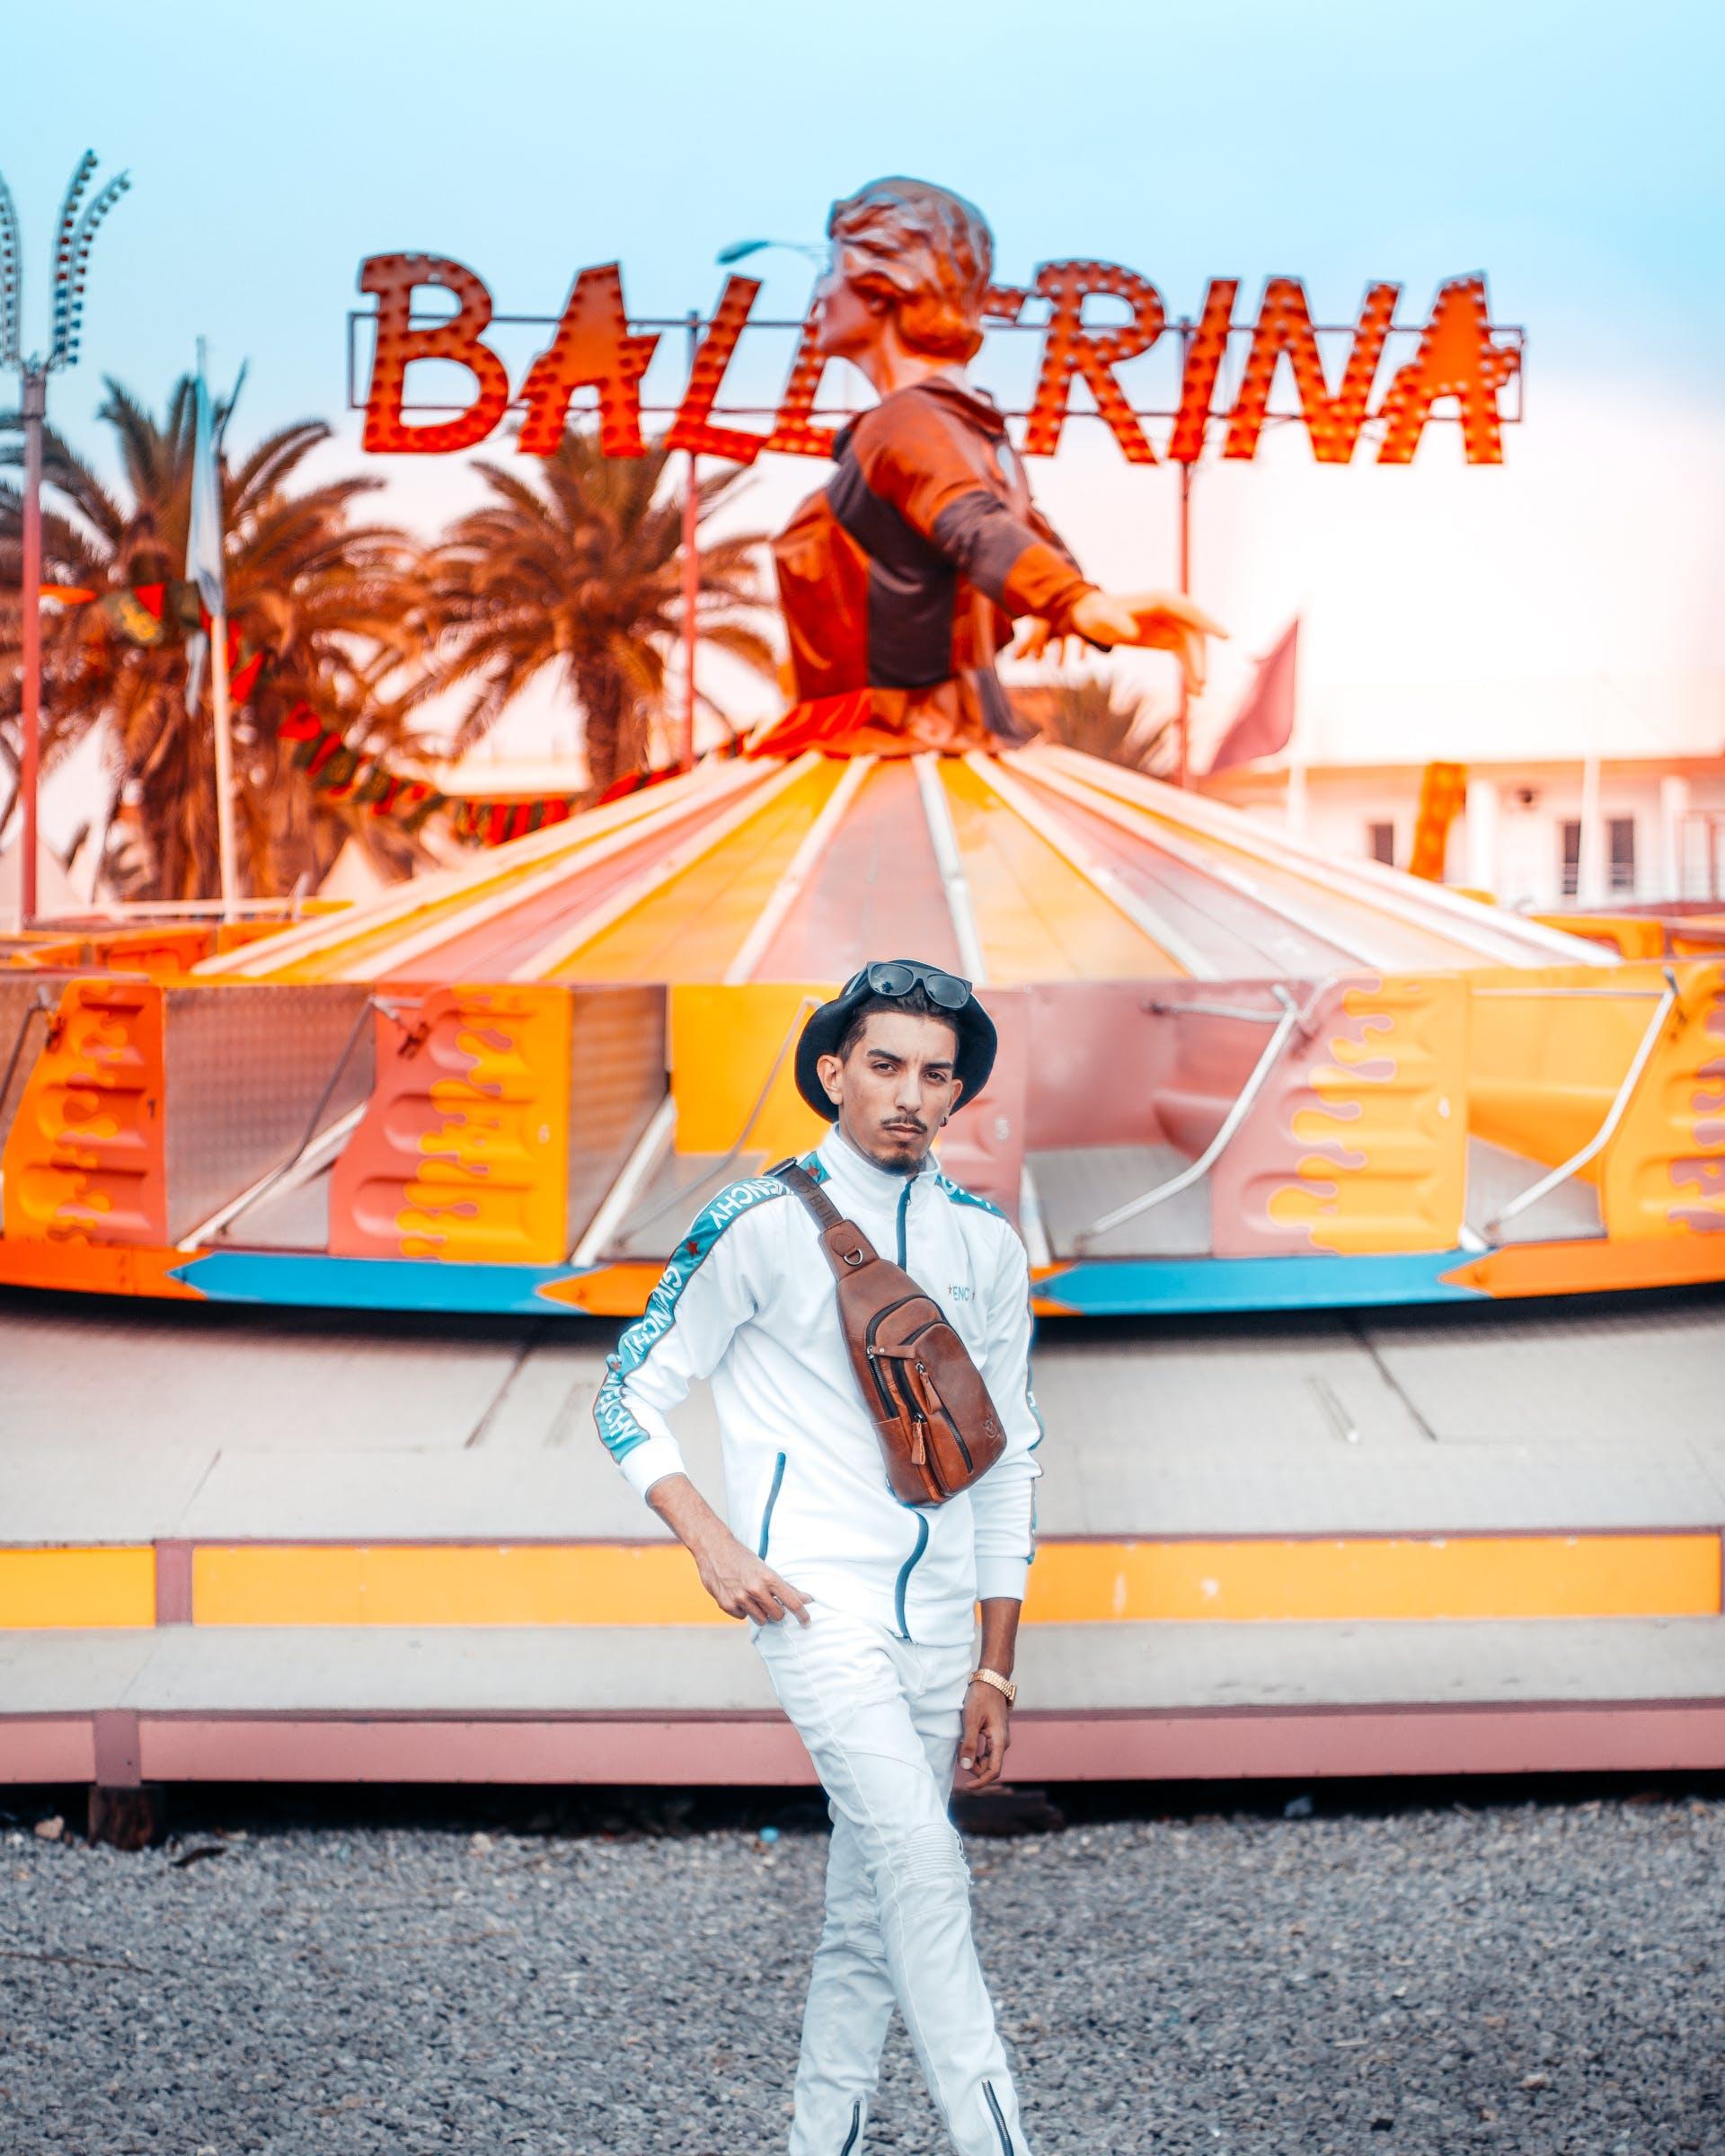 Man Standing With Balerina Statue